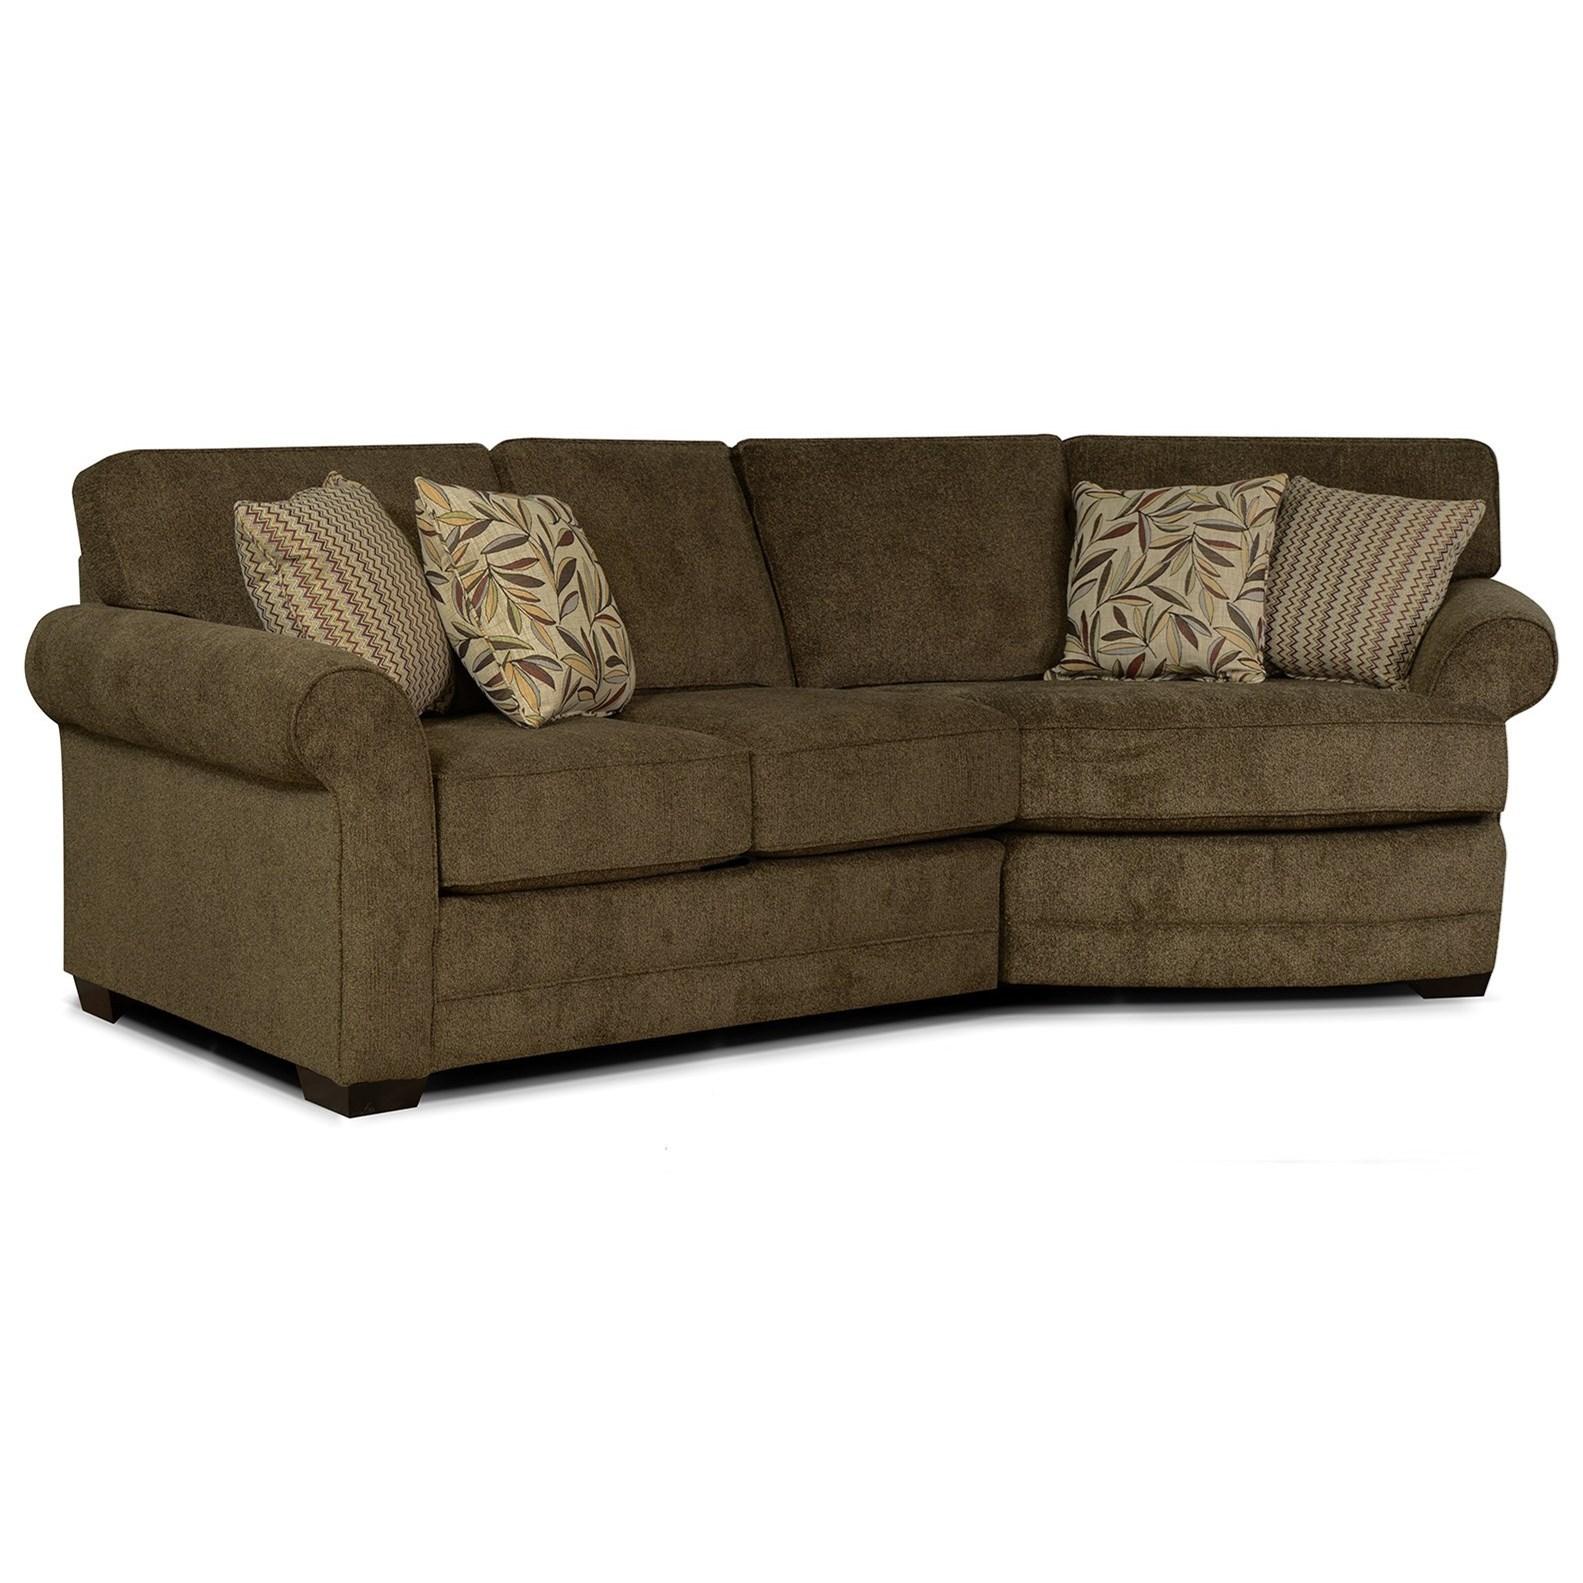 pilgrim furniture city sectional sofas